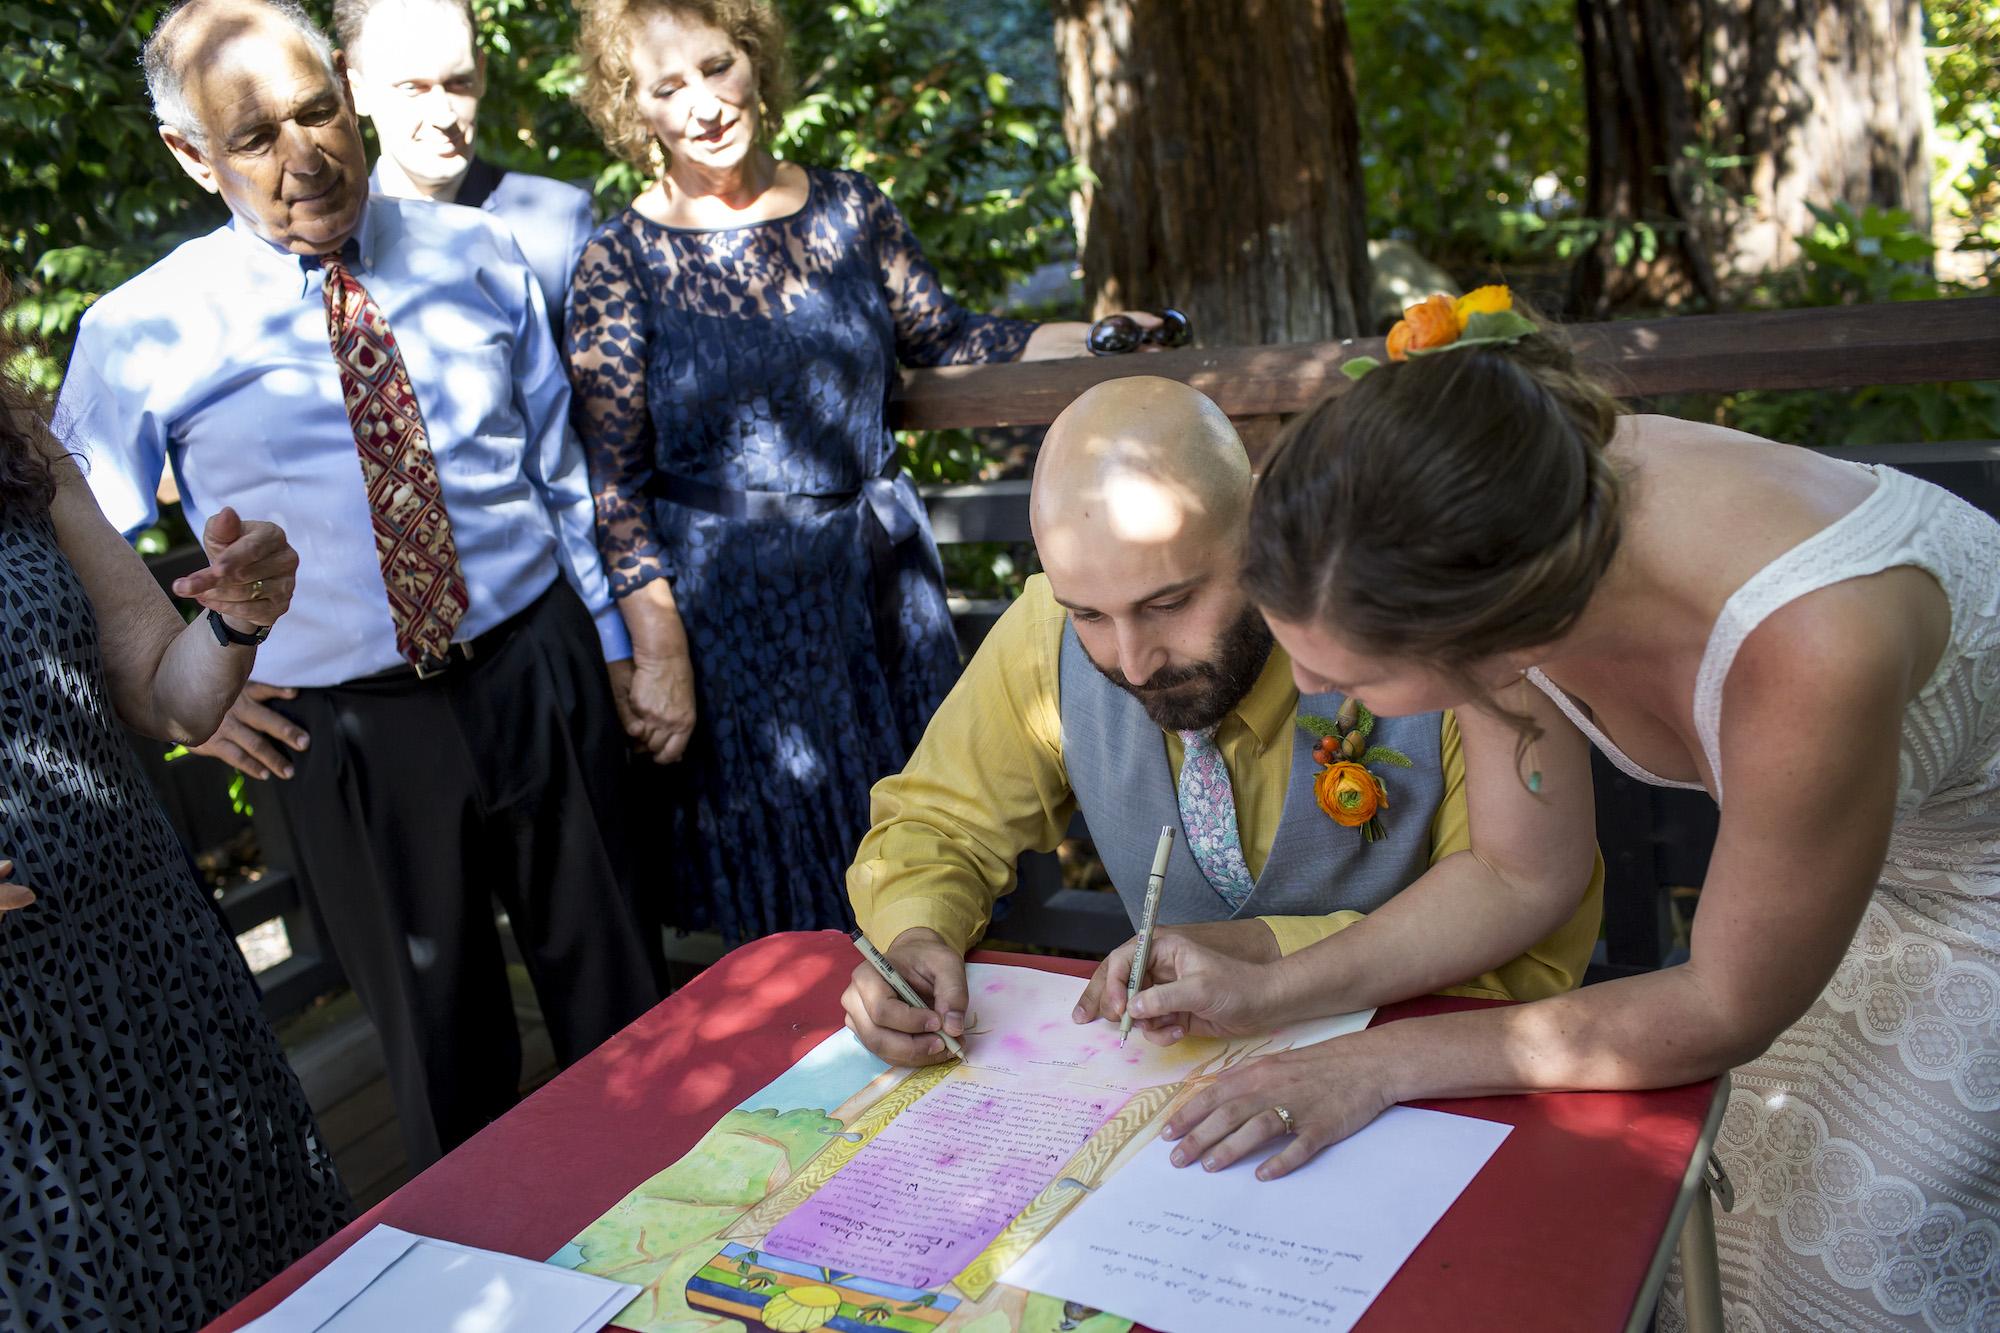 oakland-hills-jewish-wedding-deborah-coleman-photos09